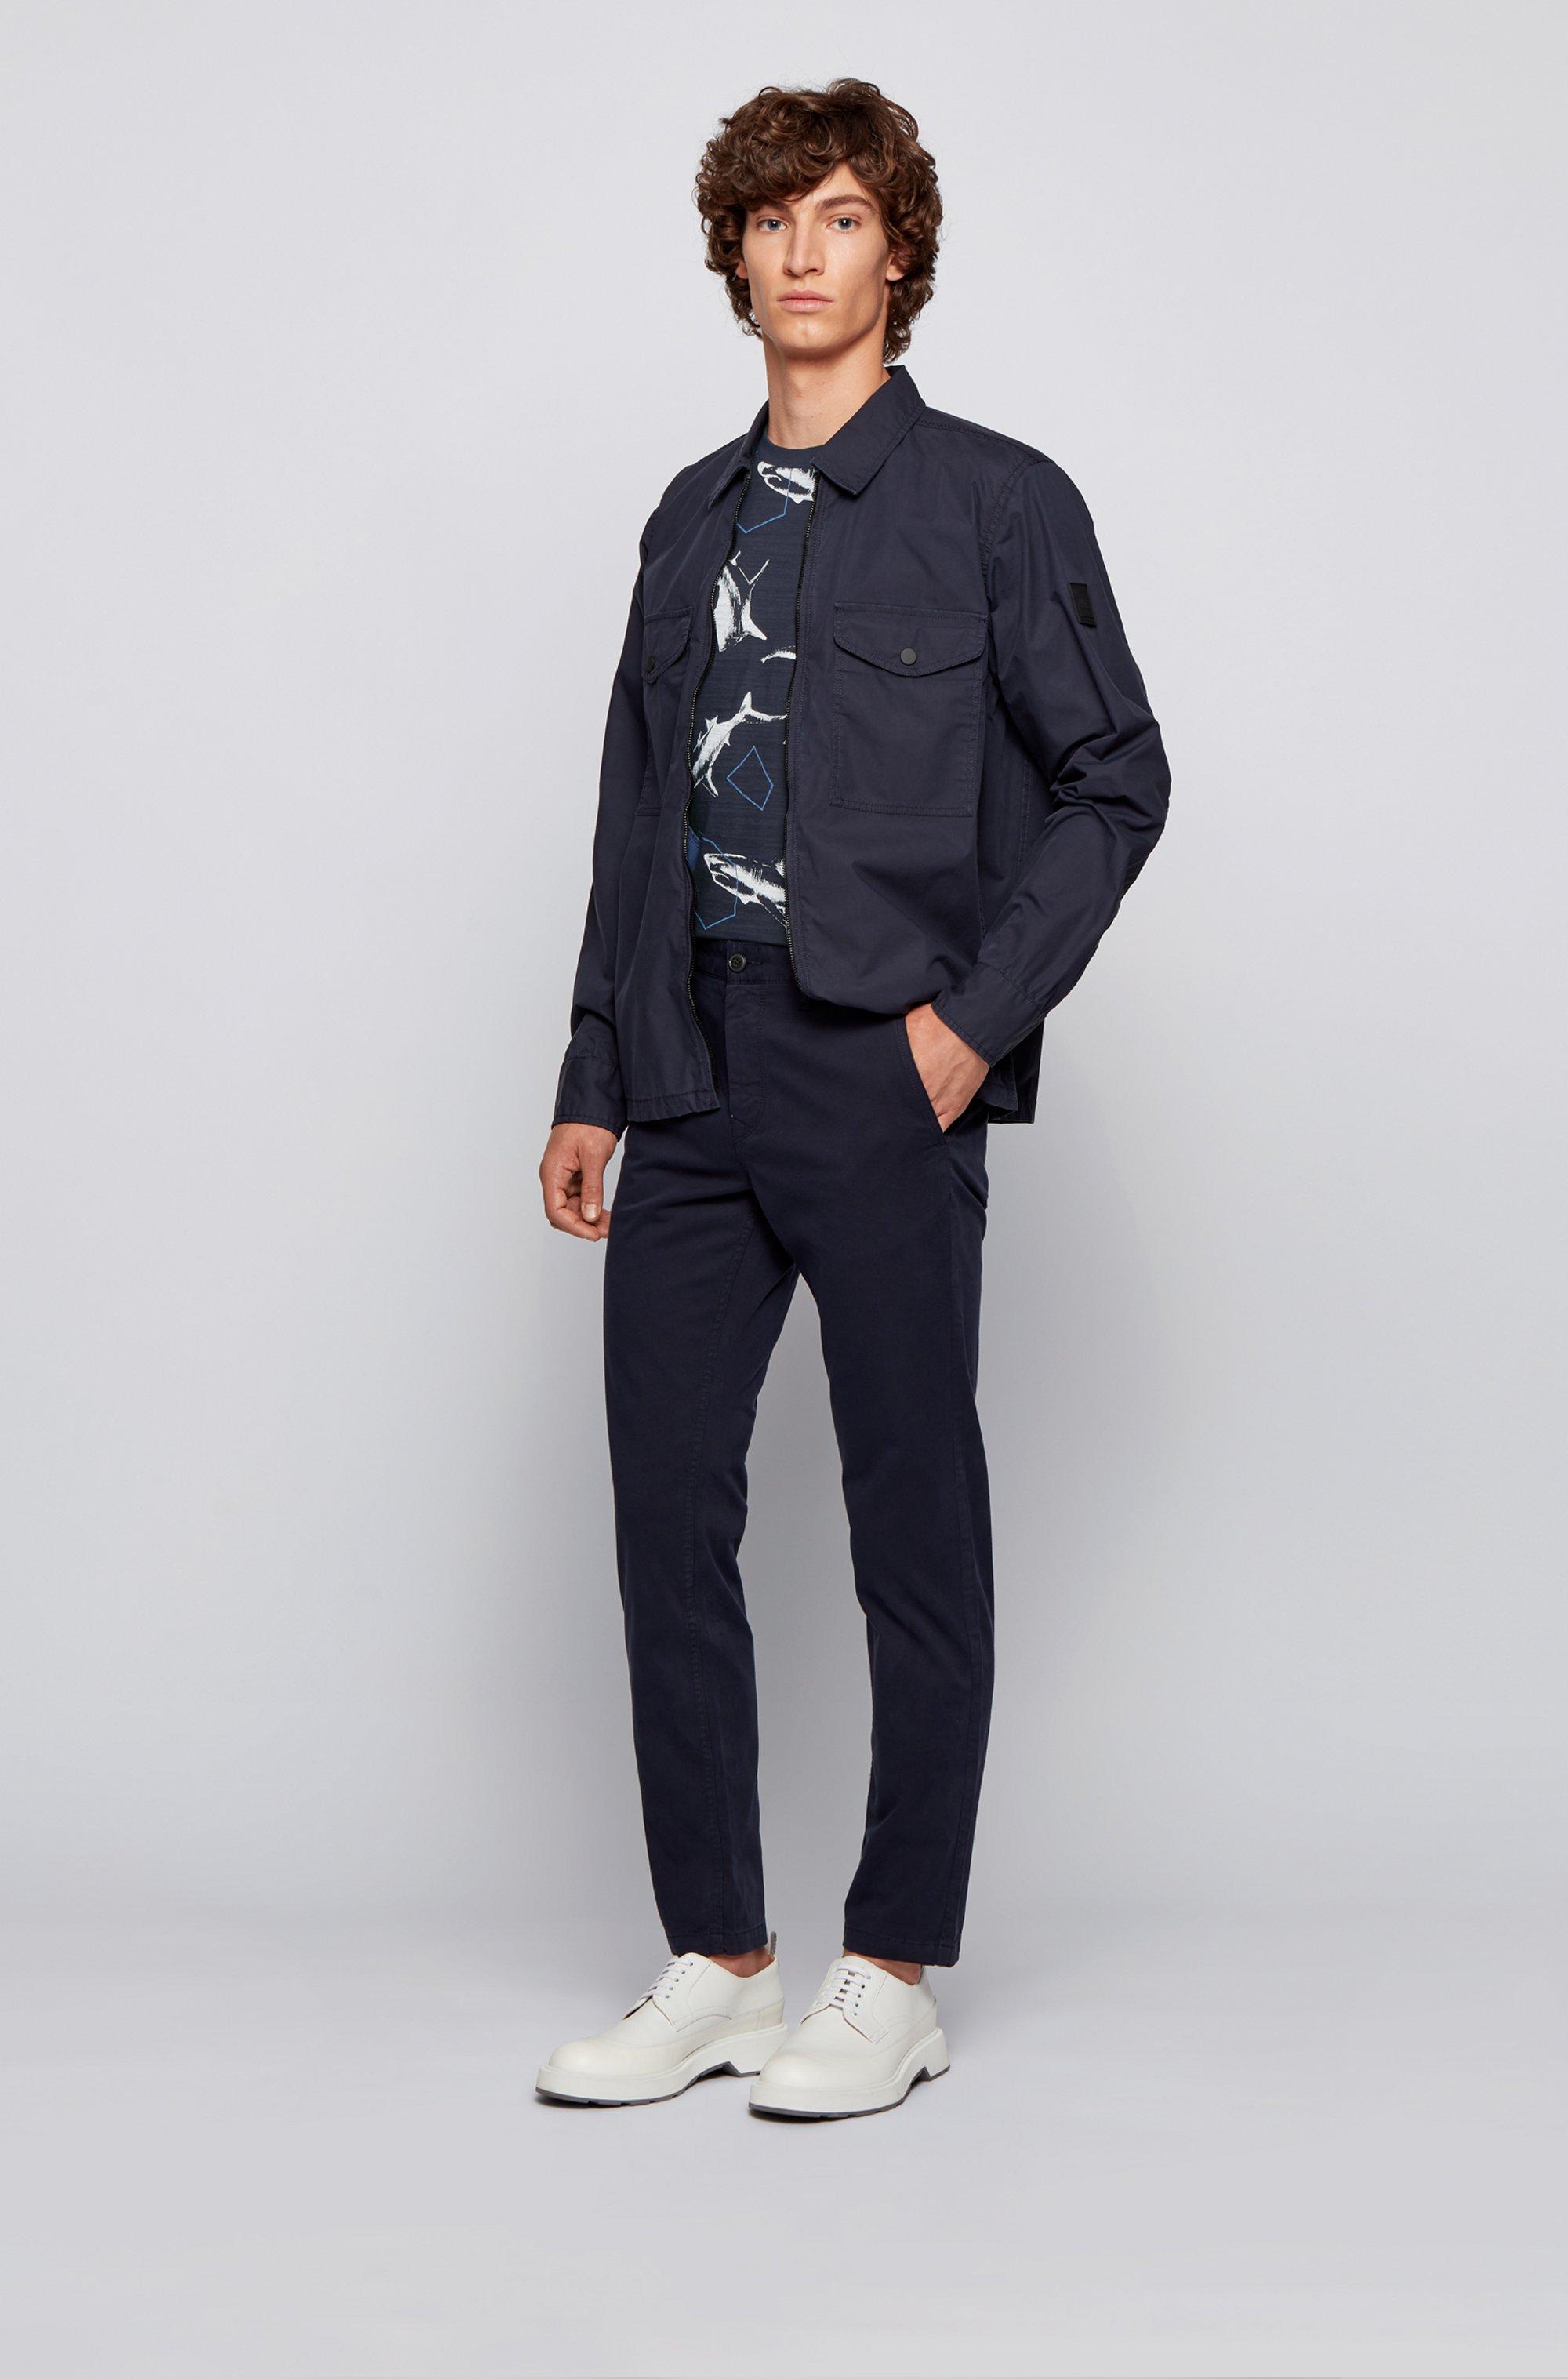 Shark-print T-shirt in slub cotton